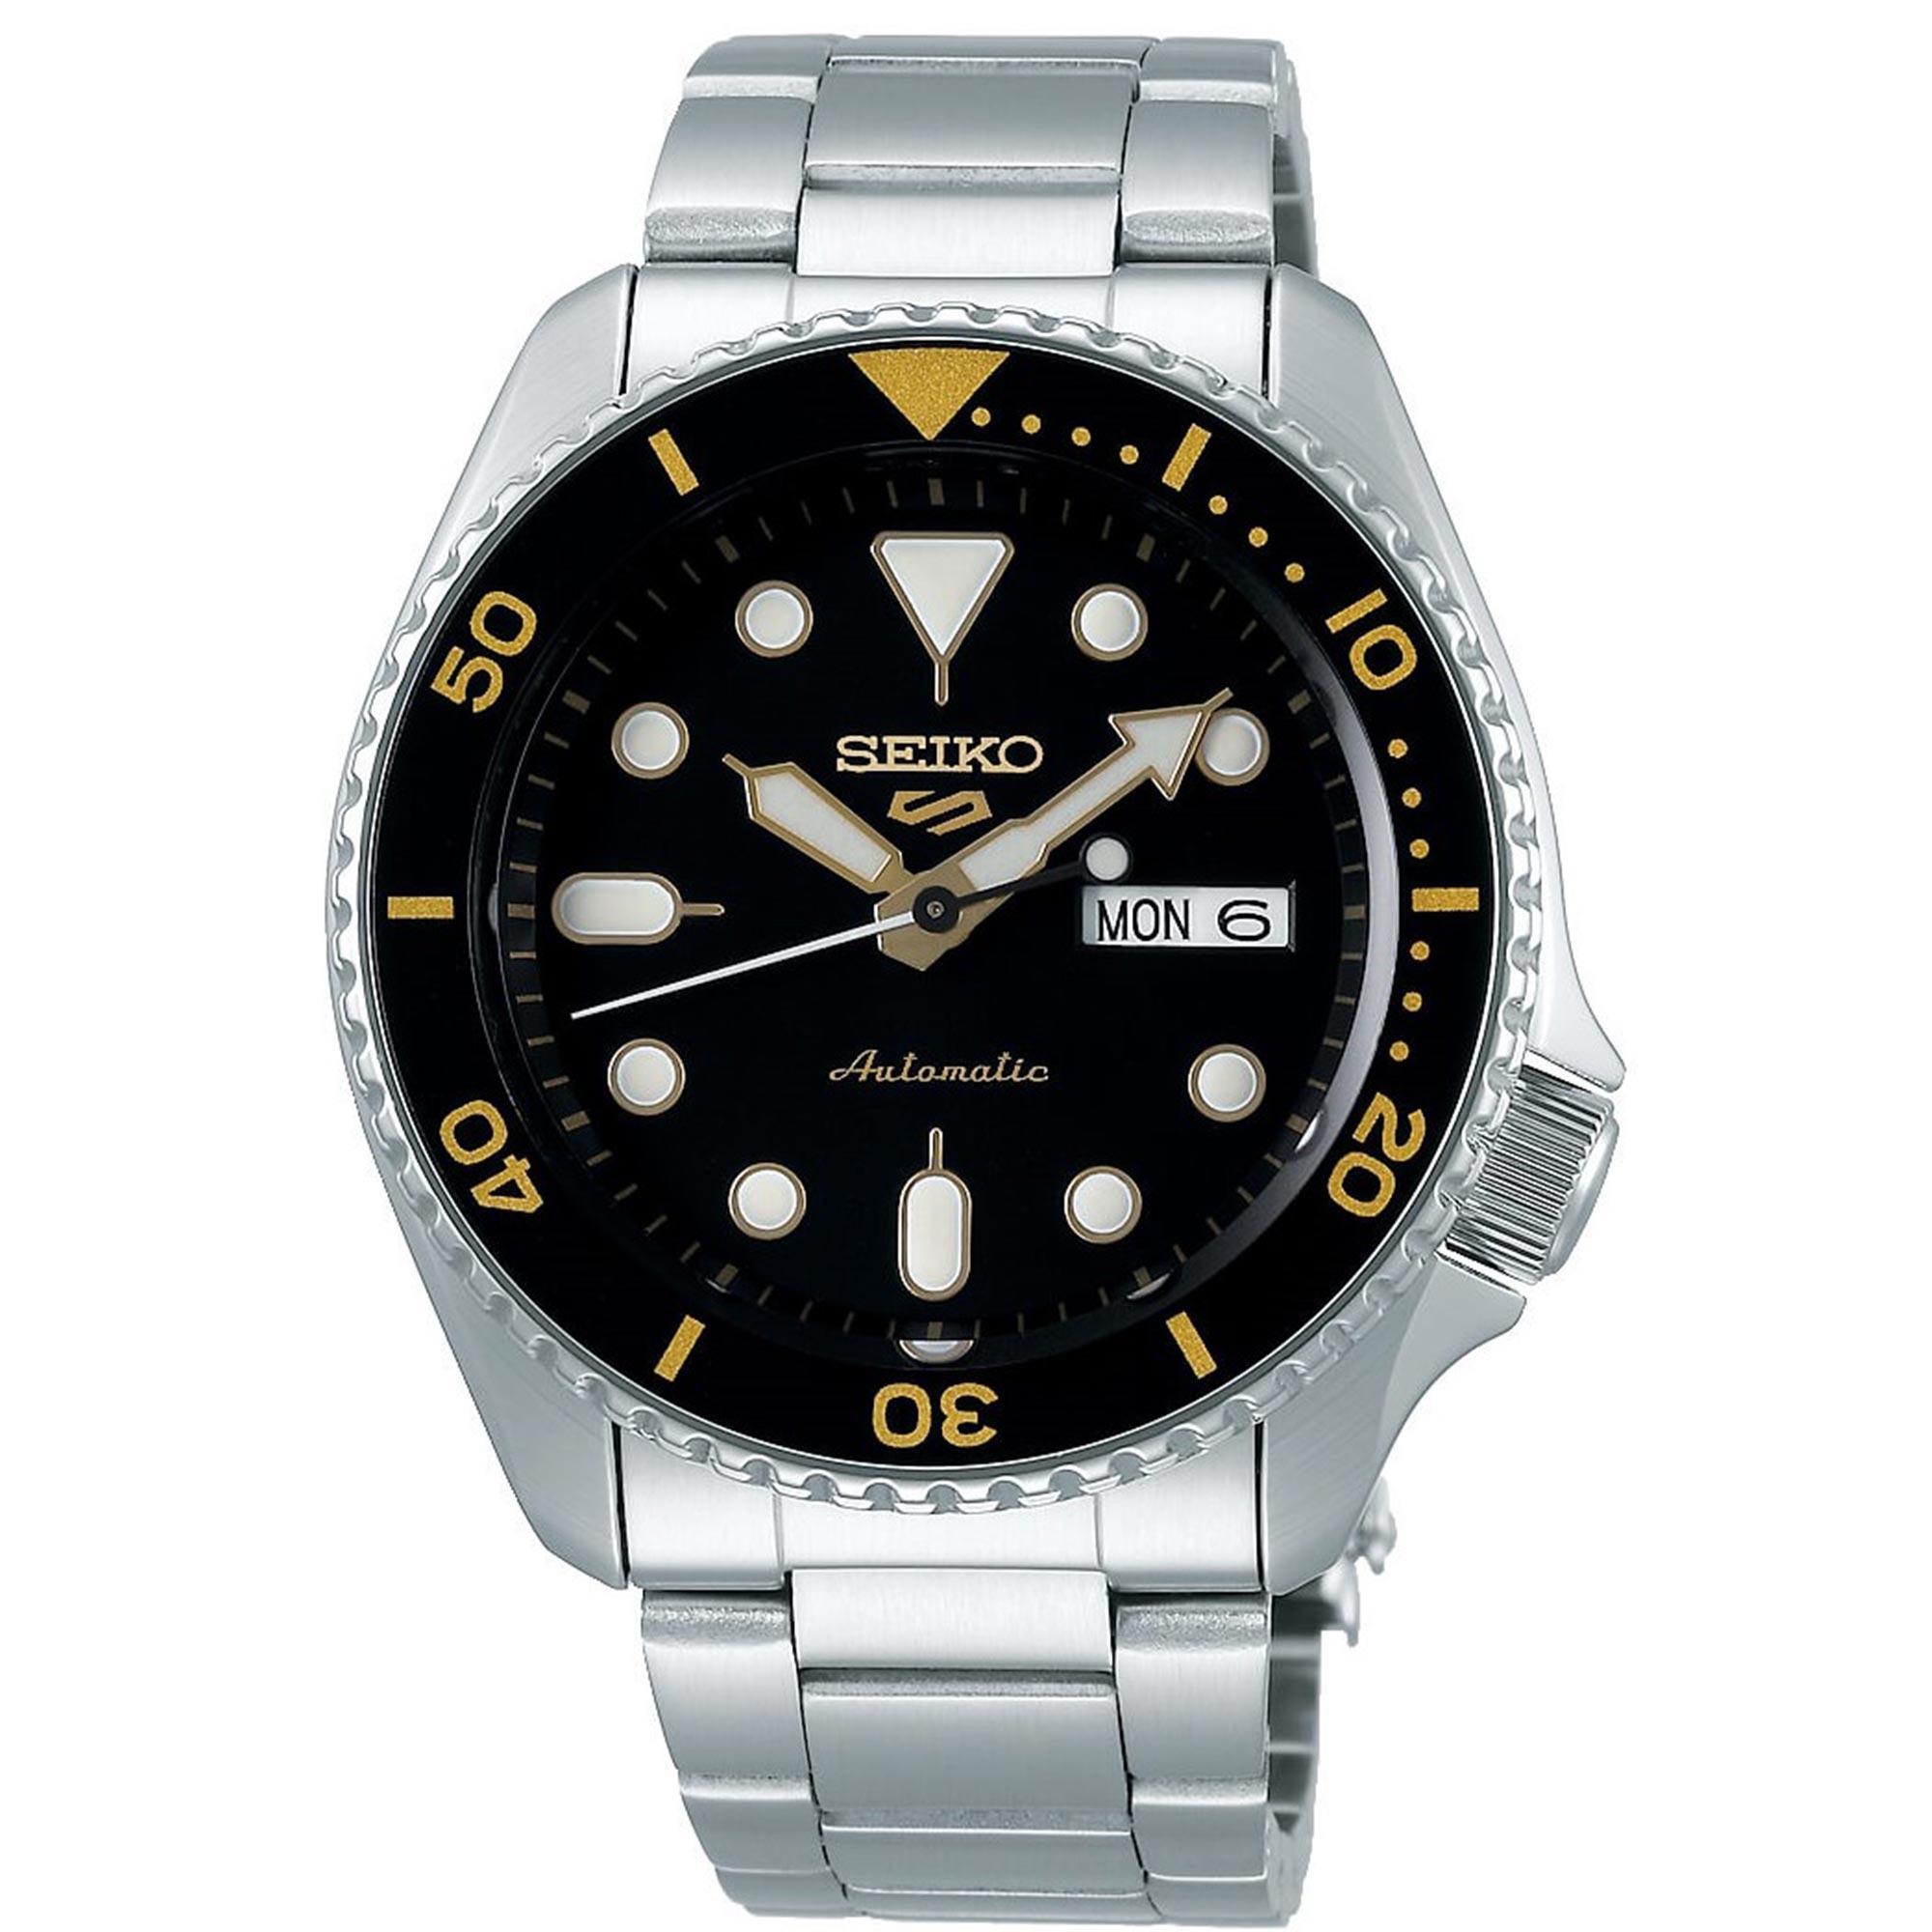 Seiko 5 Sports Black Dial Silver Stainless Steel Bracelet Automatic Men's Watch SRPD57K1